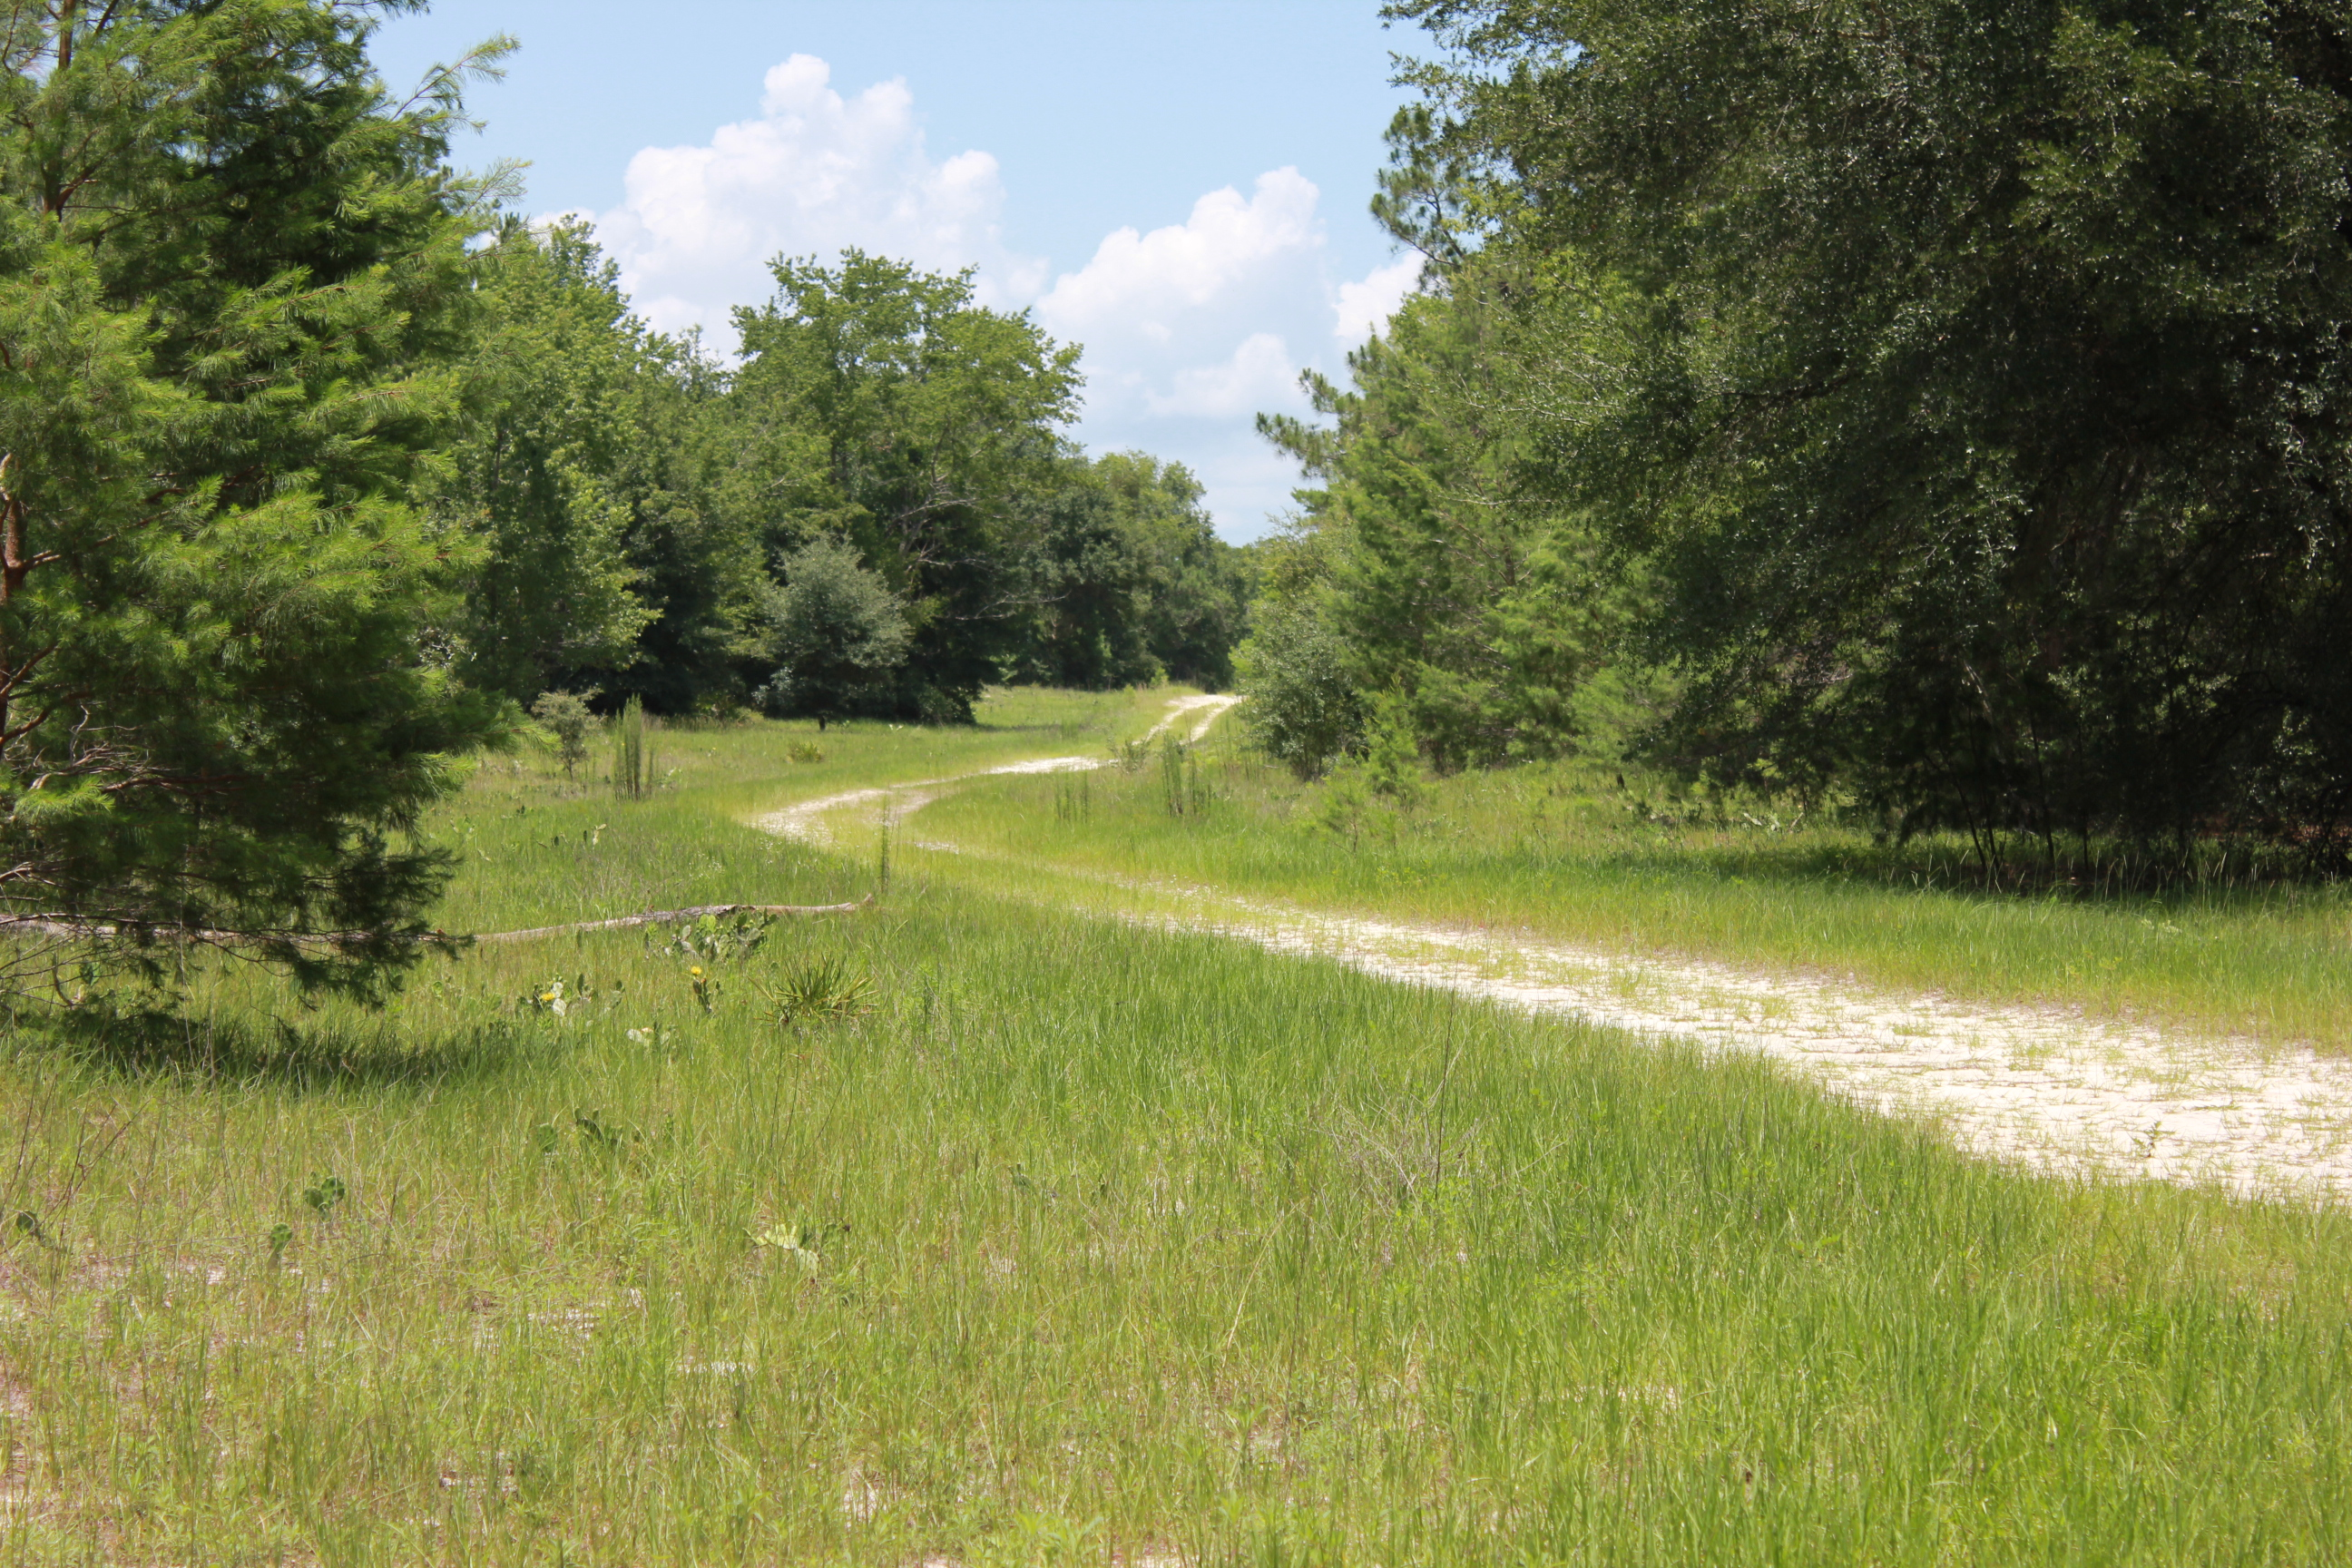 ponoma park florida 5 3 acres for sale